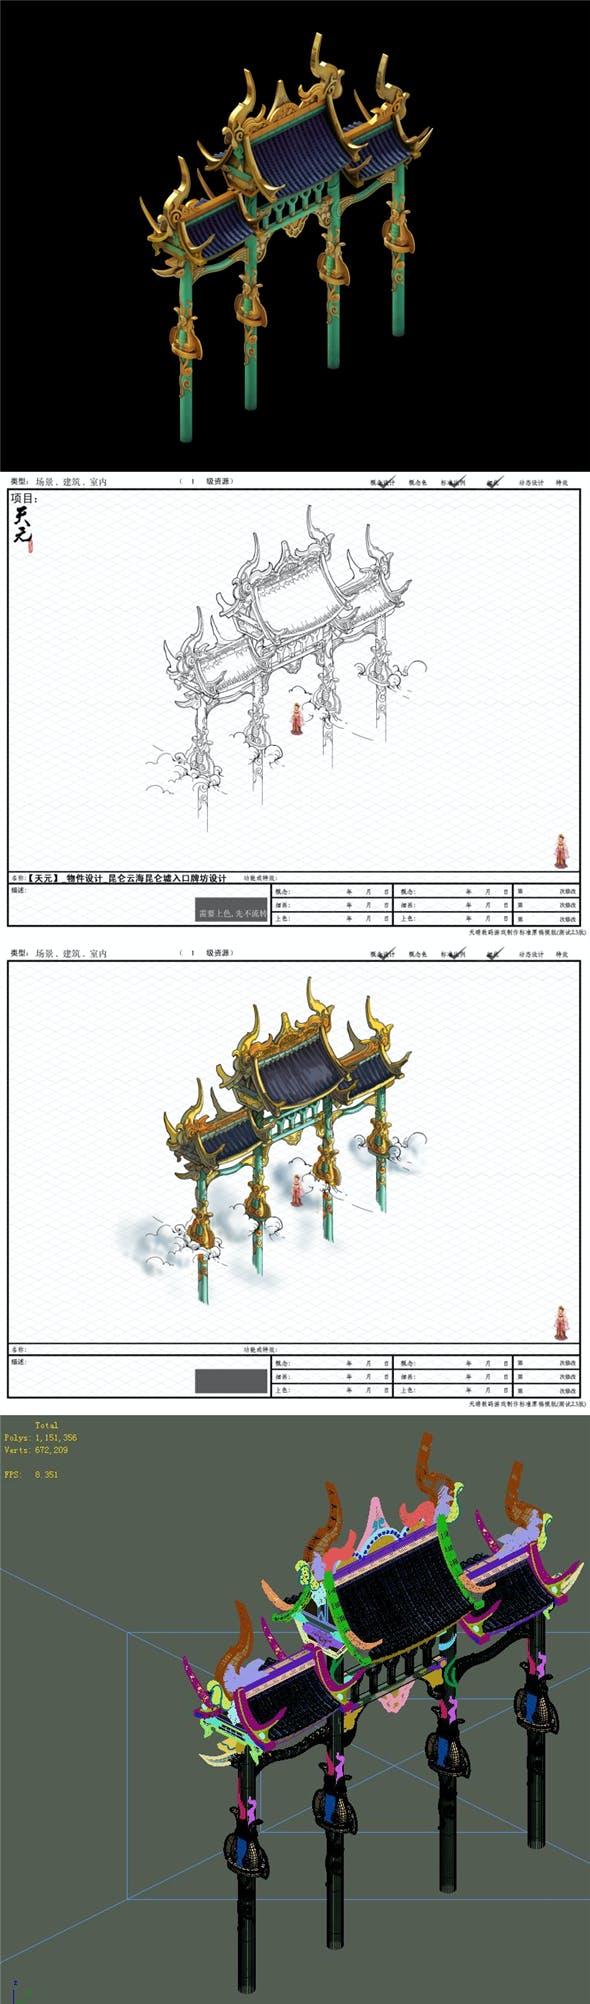 Game model - the sky garden - heaven entrance arch - 3DOcean Item for Sale